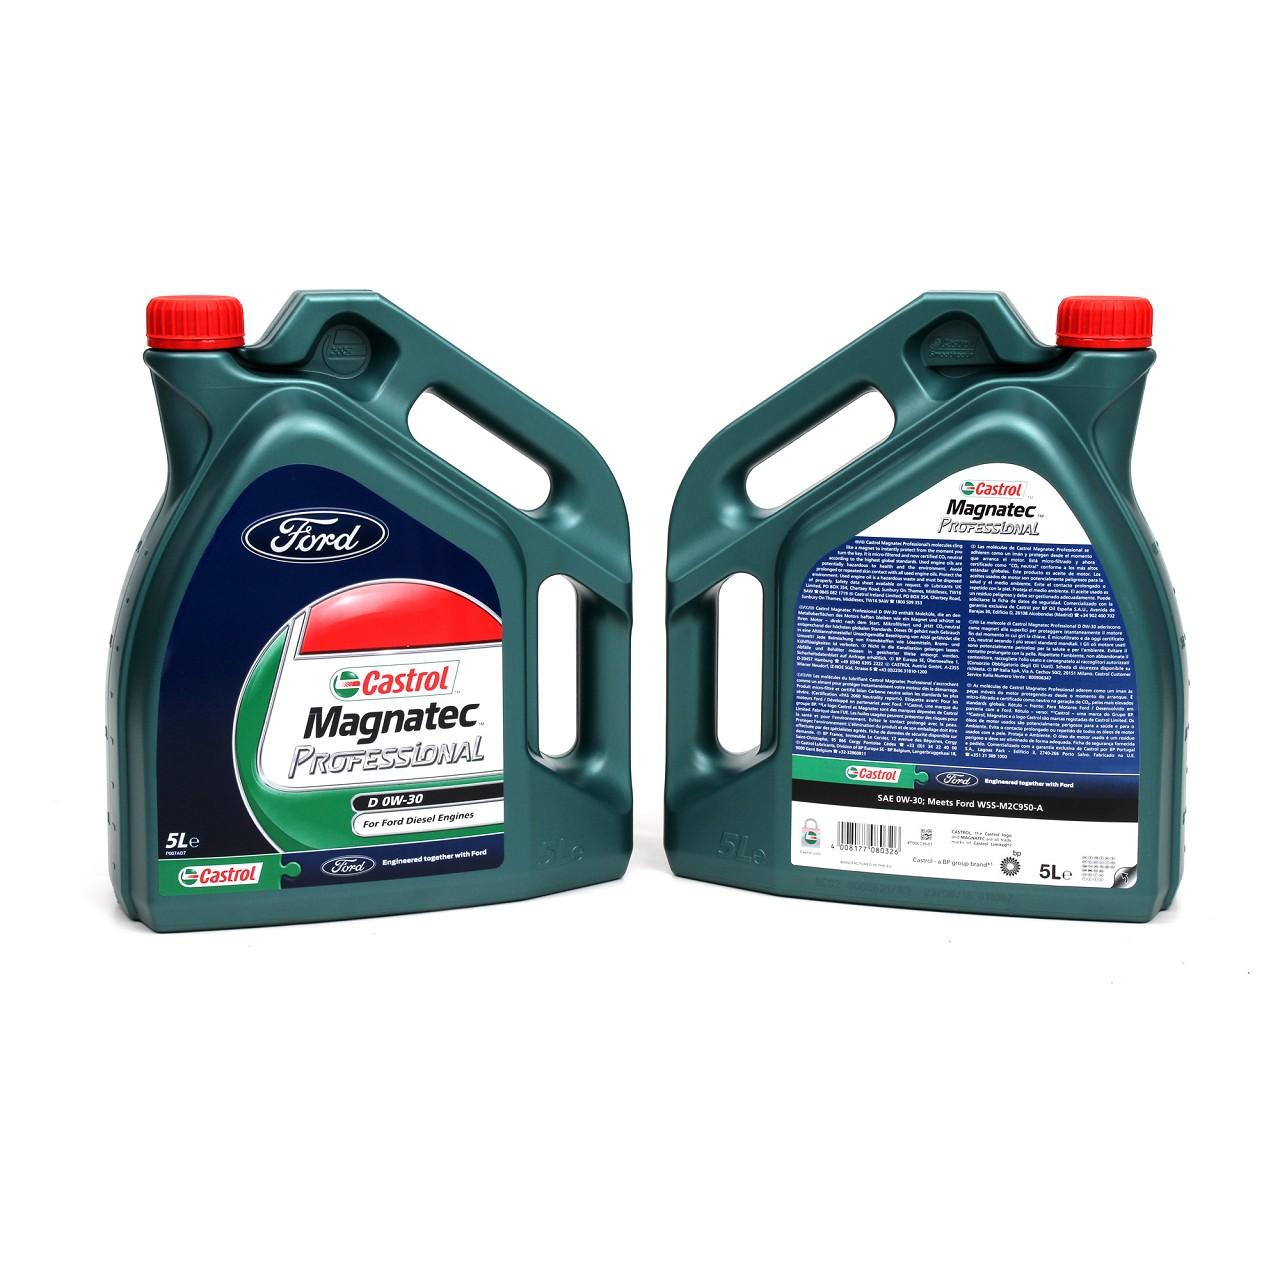 ORIGINAL Ford CASTROL Motoröl Öl D 0W30 Magnatec Professional 10 Liter 15D5FF